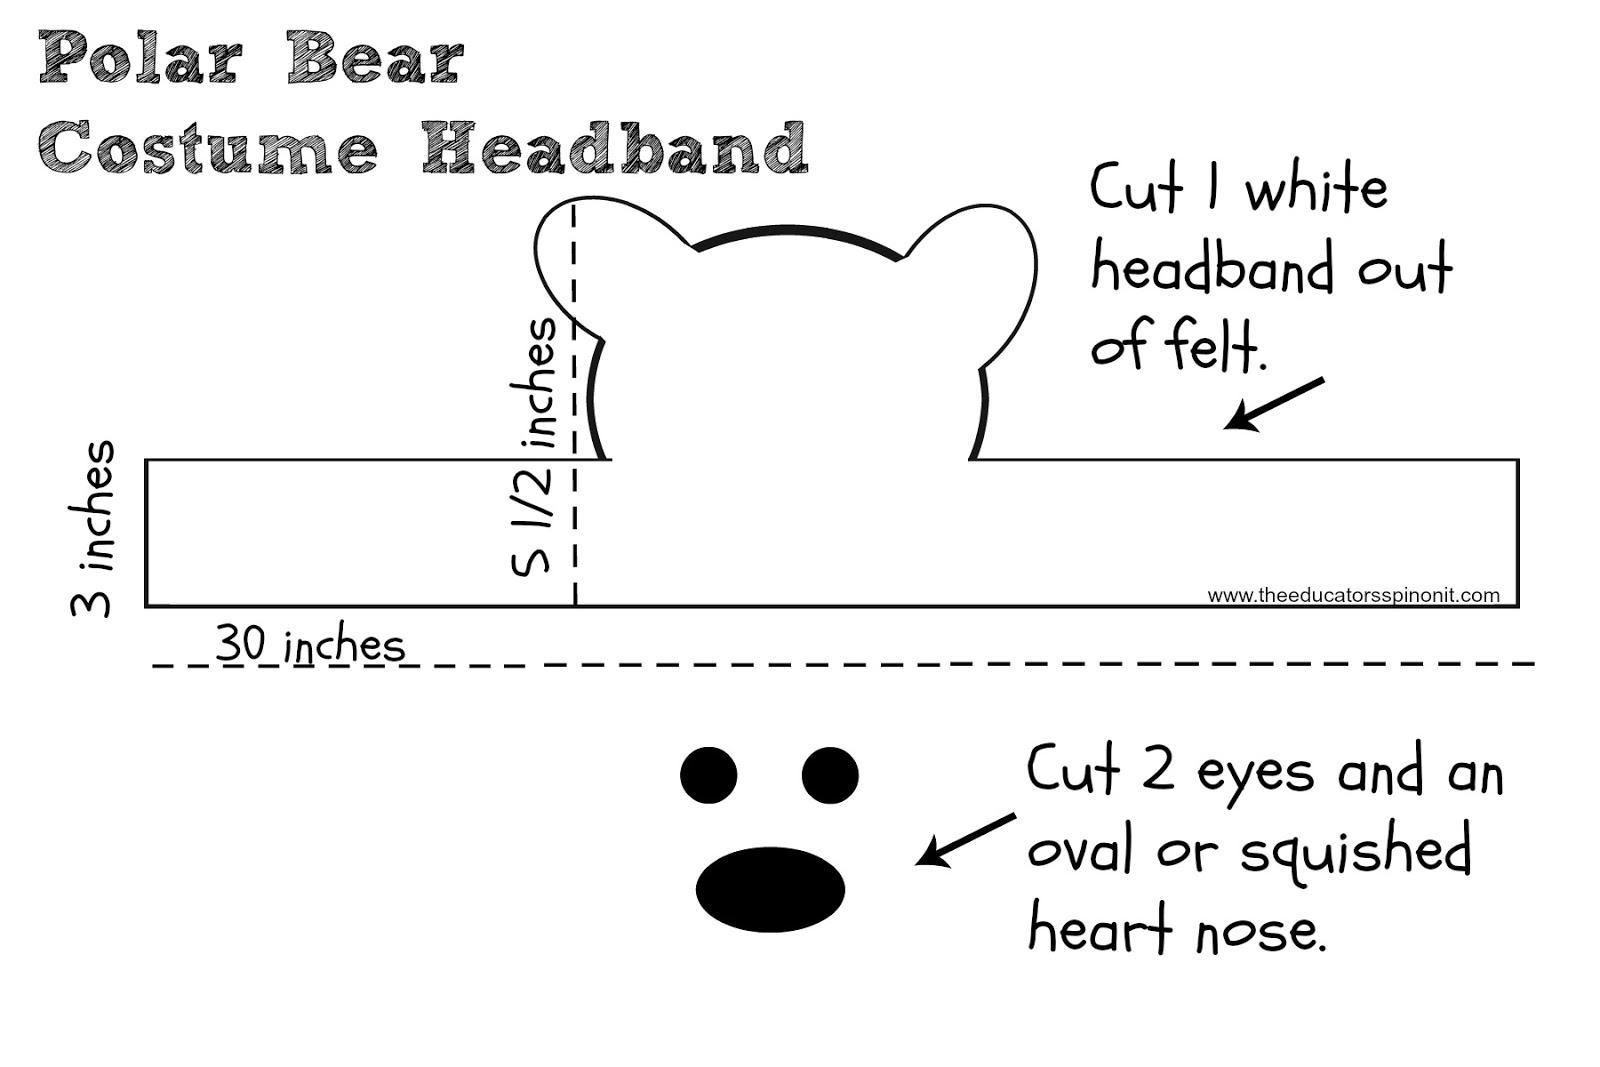 The Educators Spin On It Polar Bear Costume Headband For